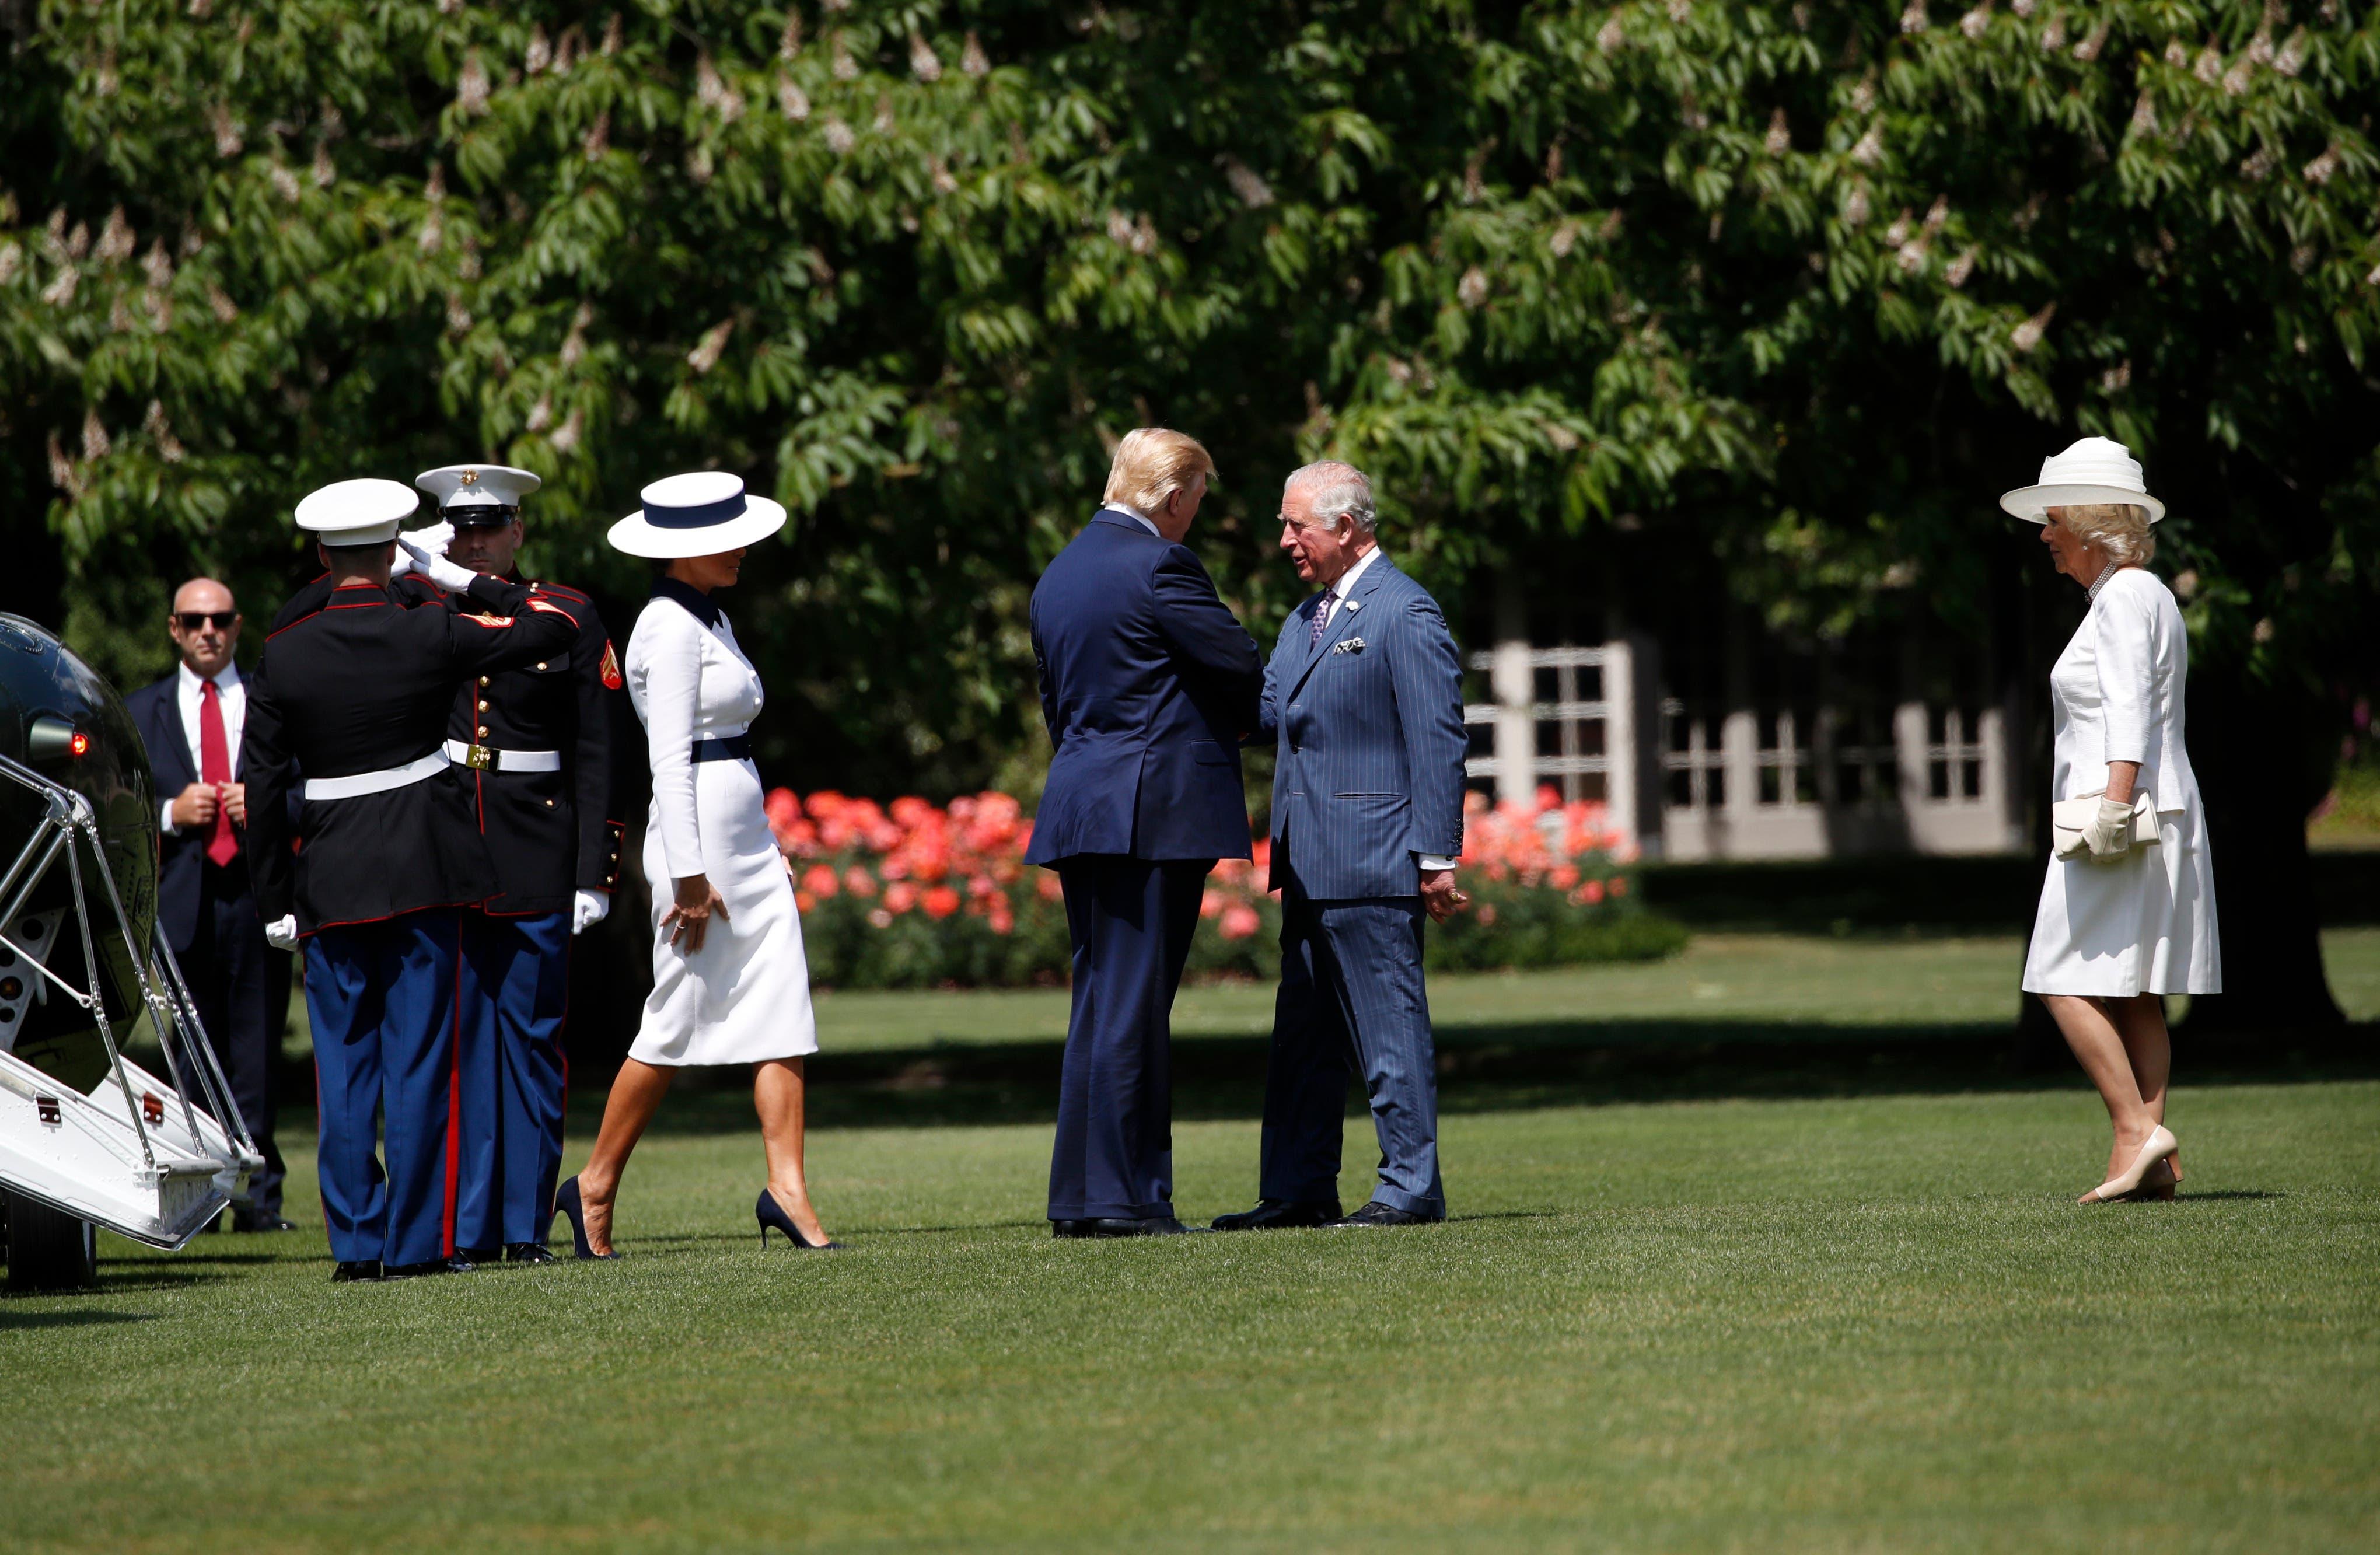 Donald Trump, Prince Charles